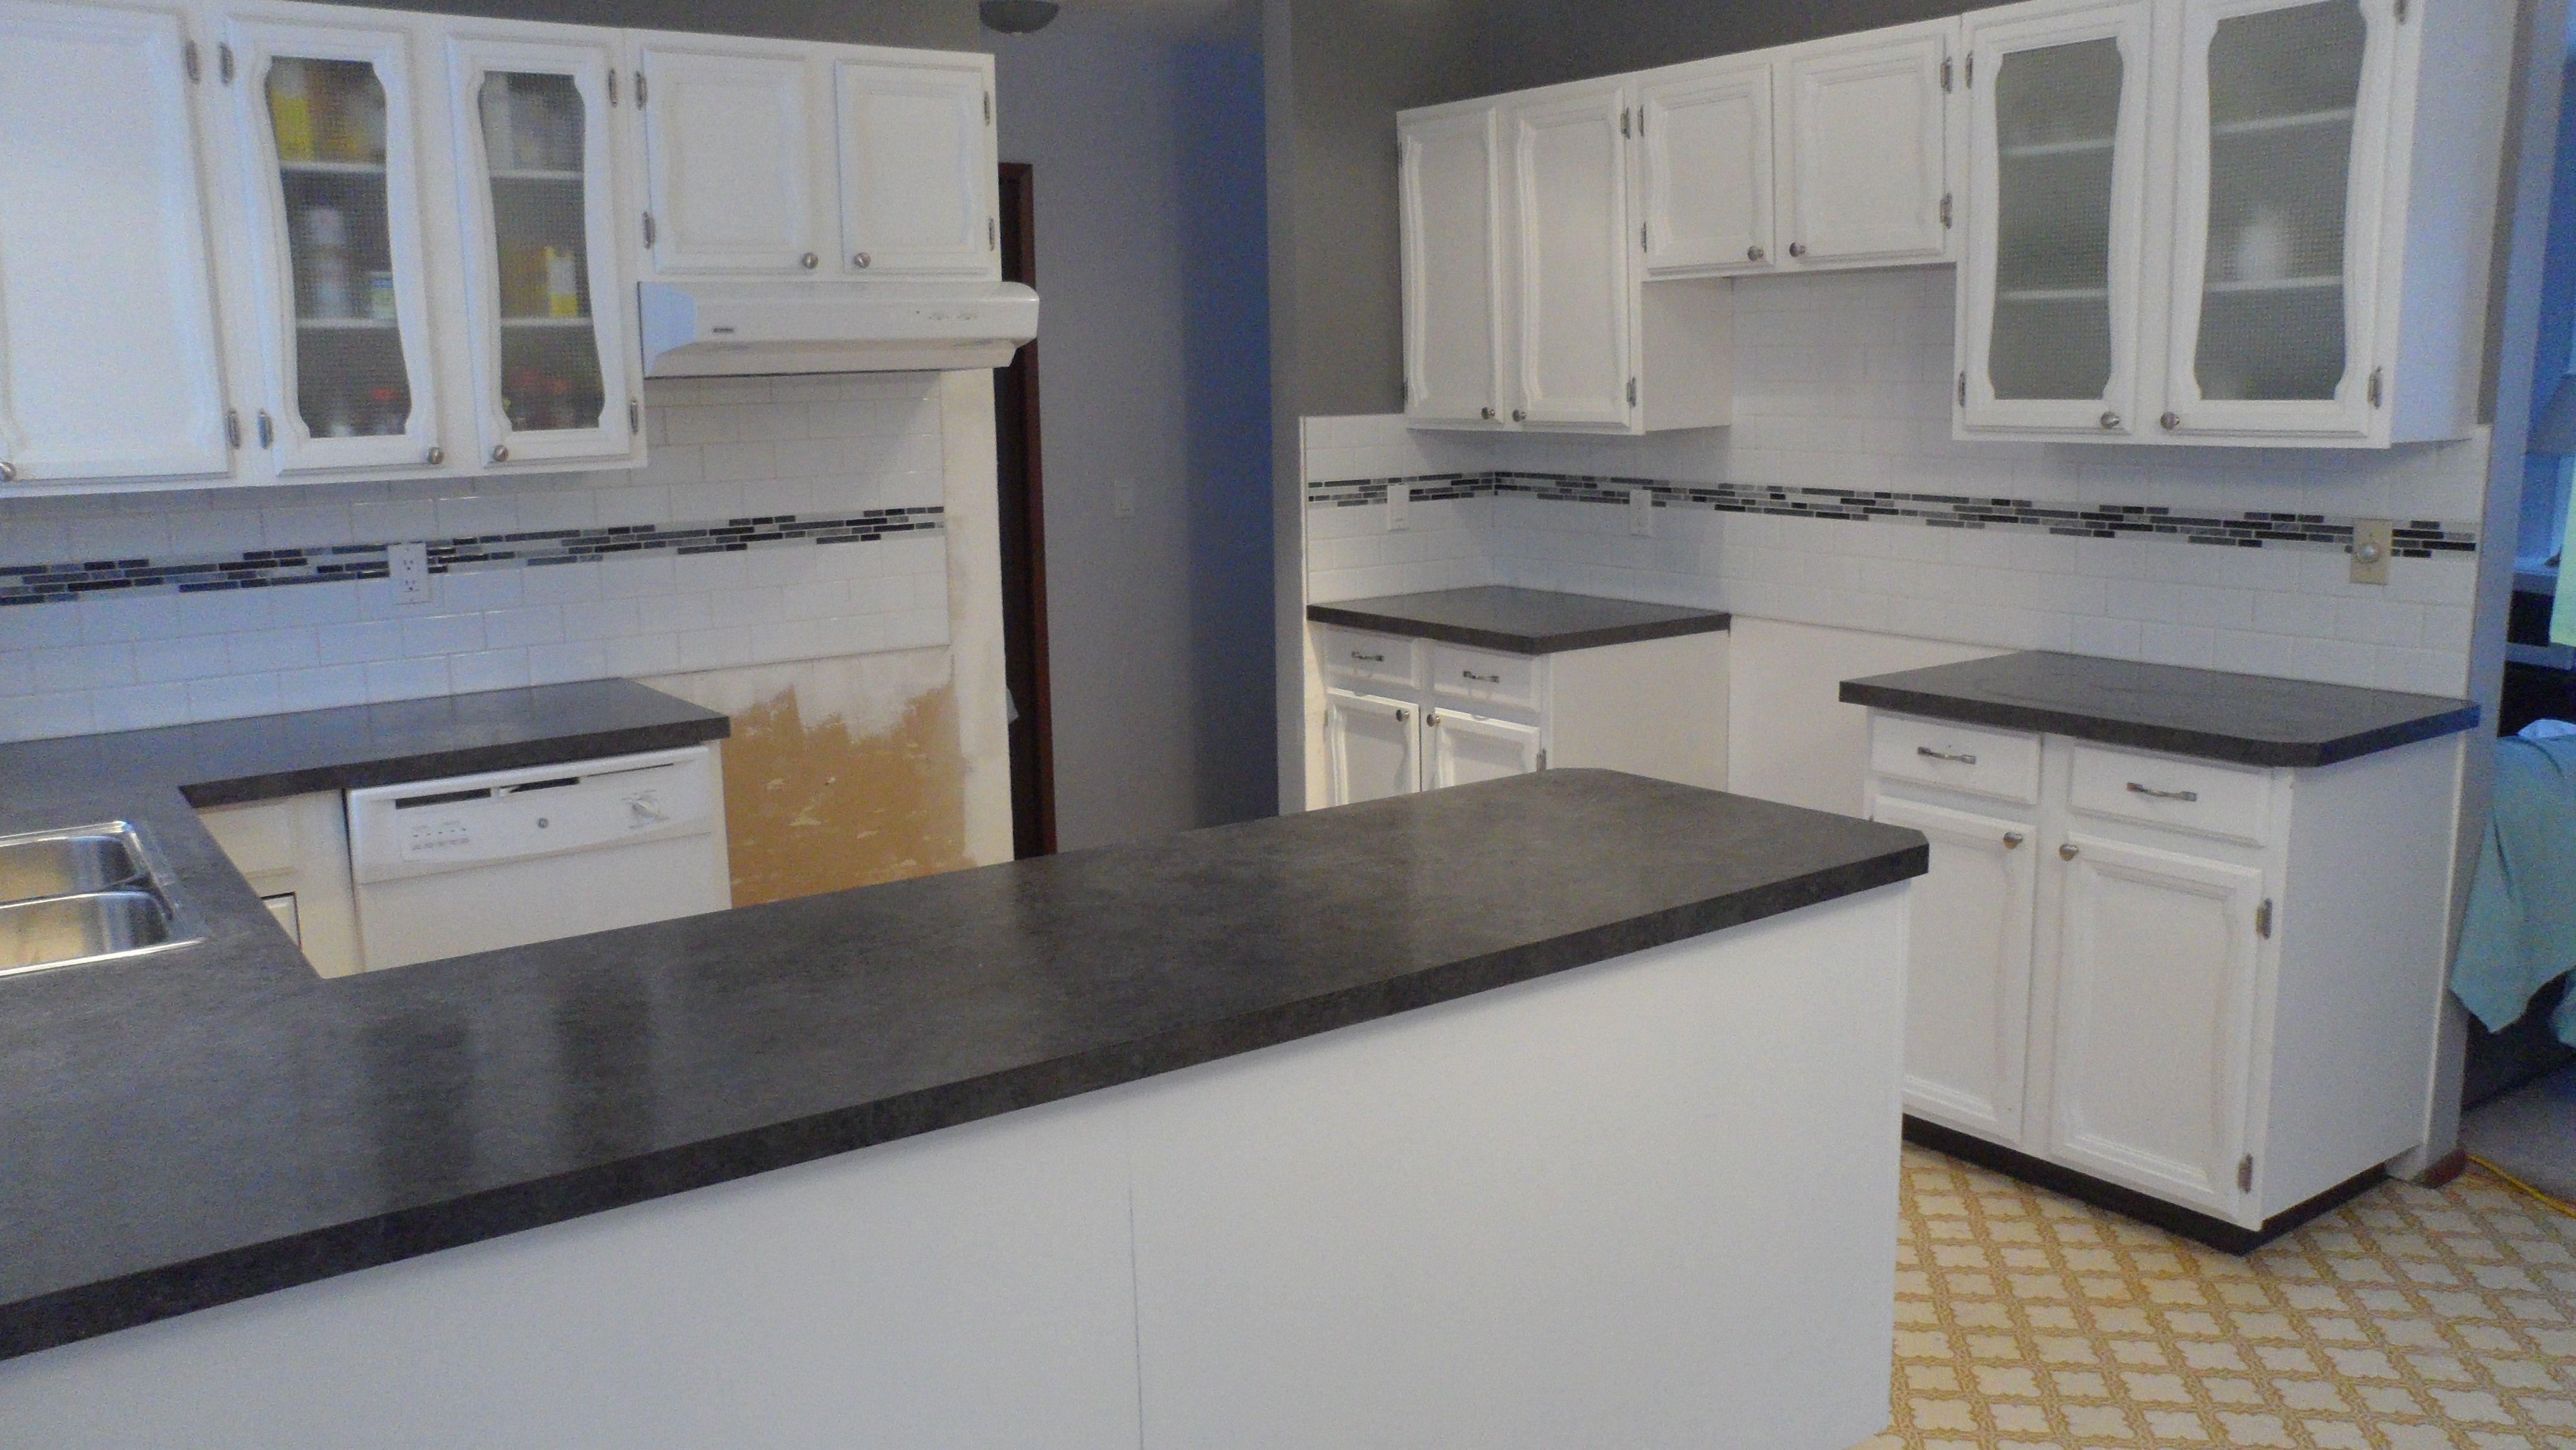 Offset White Ceramic Subway Tile With Black And White